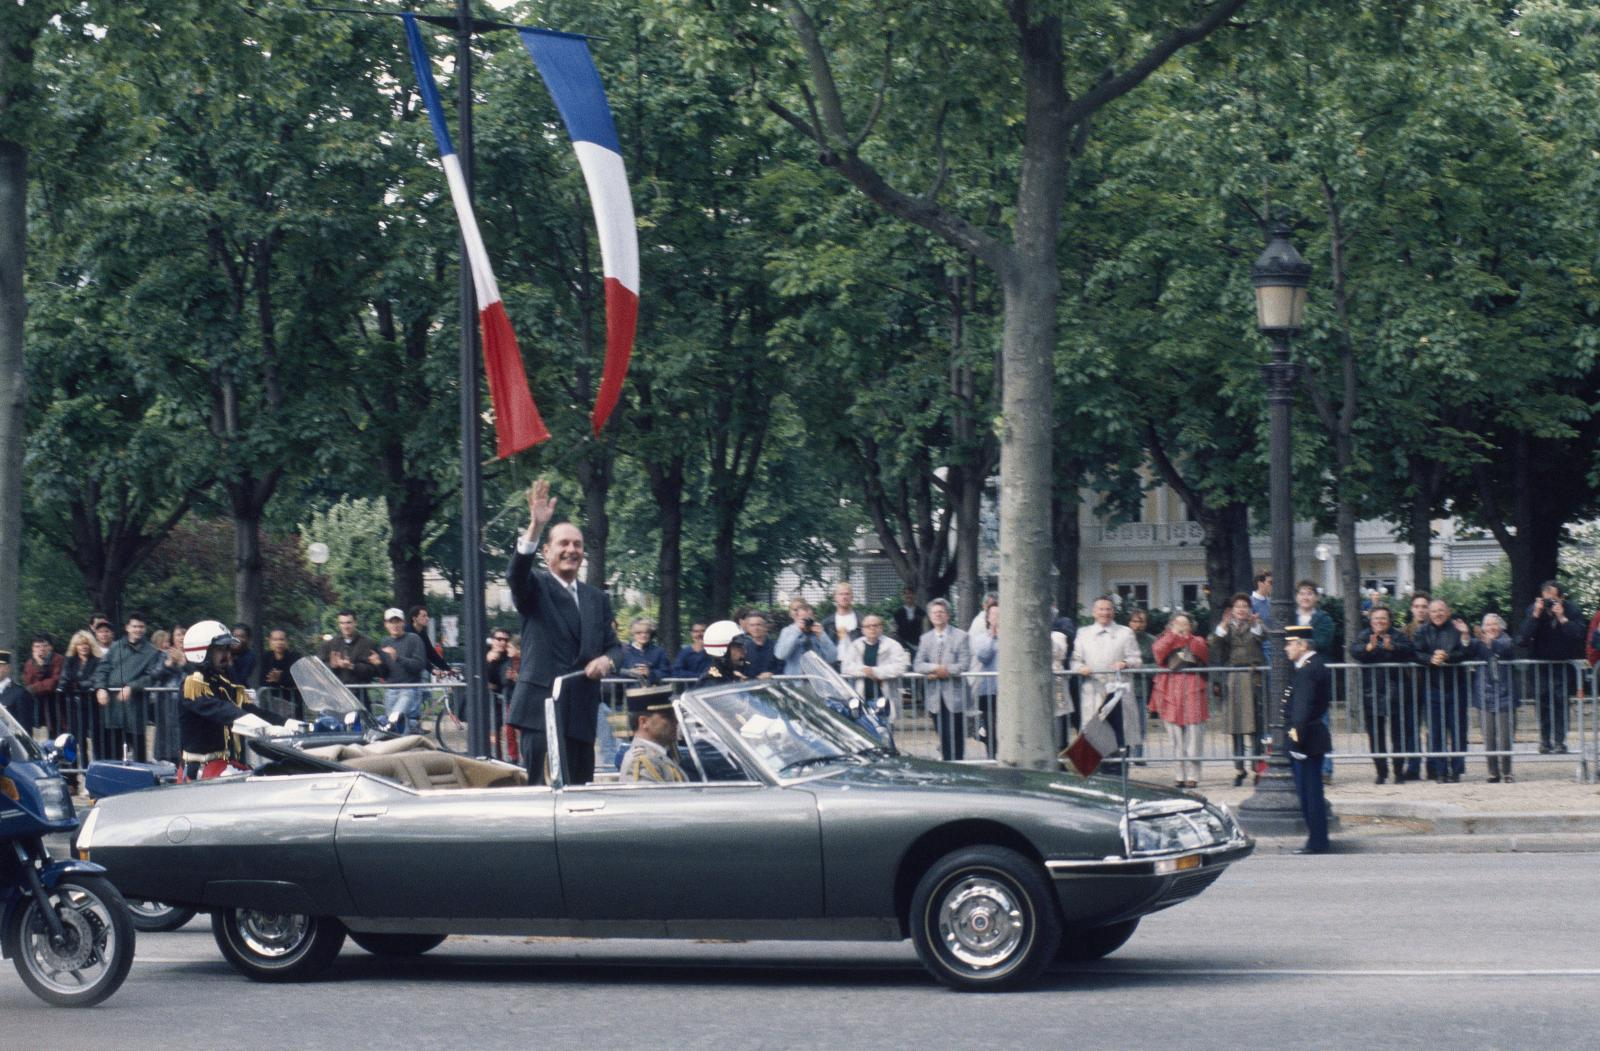 Jacques Chirac SM Devlet Başkanlığı aracında - 1995